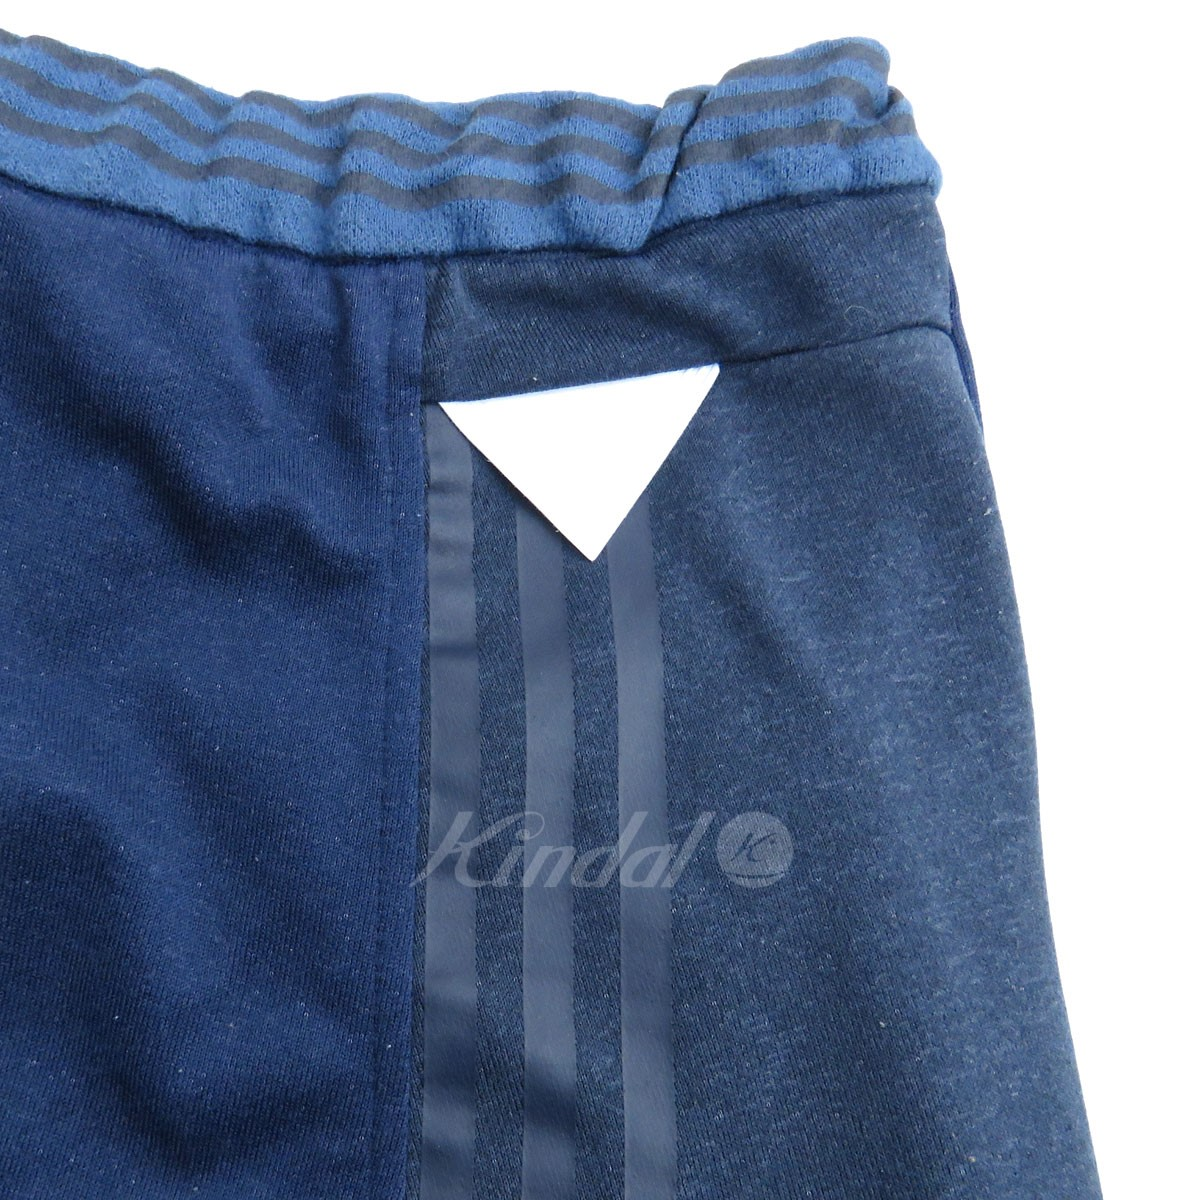 adidas Originals by White Mountaineering sweat shirt shorts short pants navy size: M (??????????????????????????)